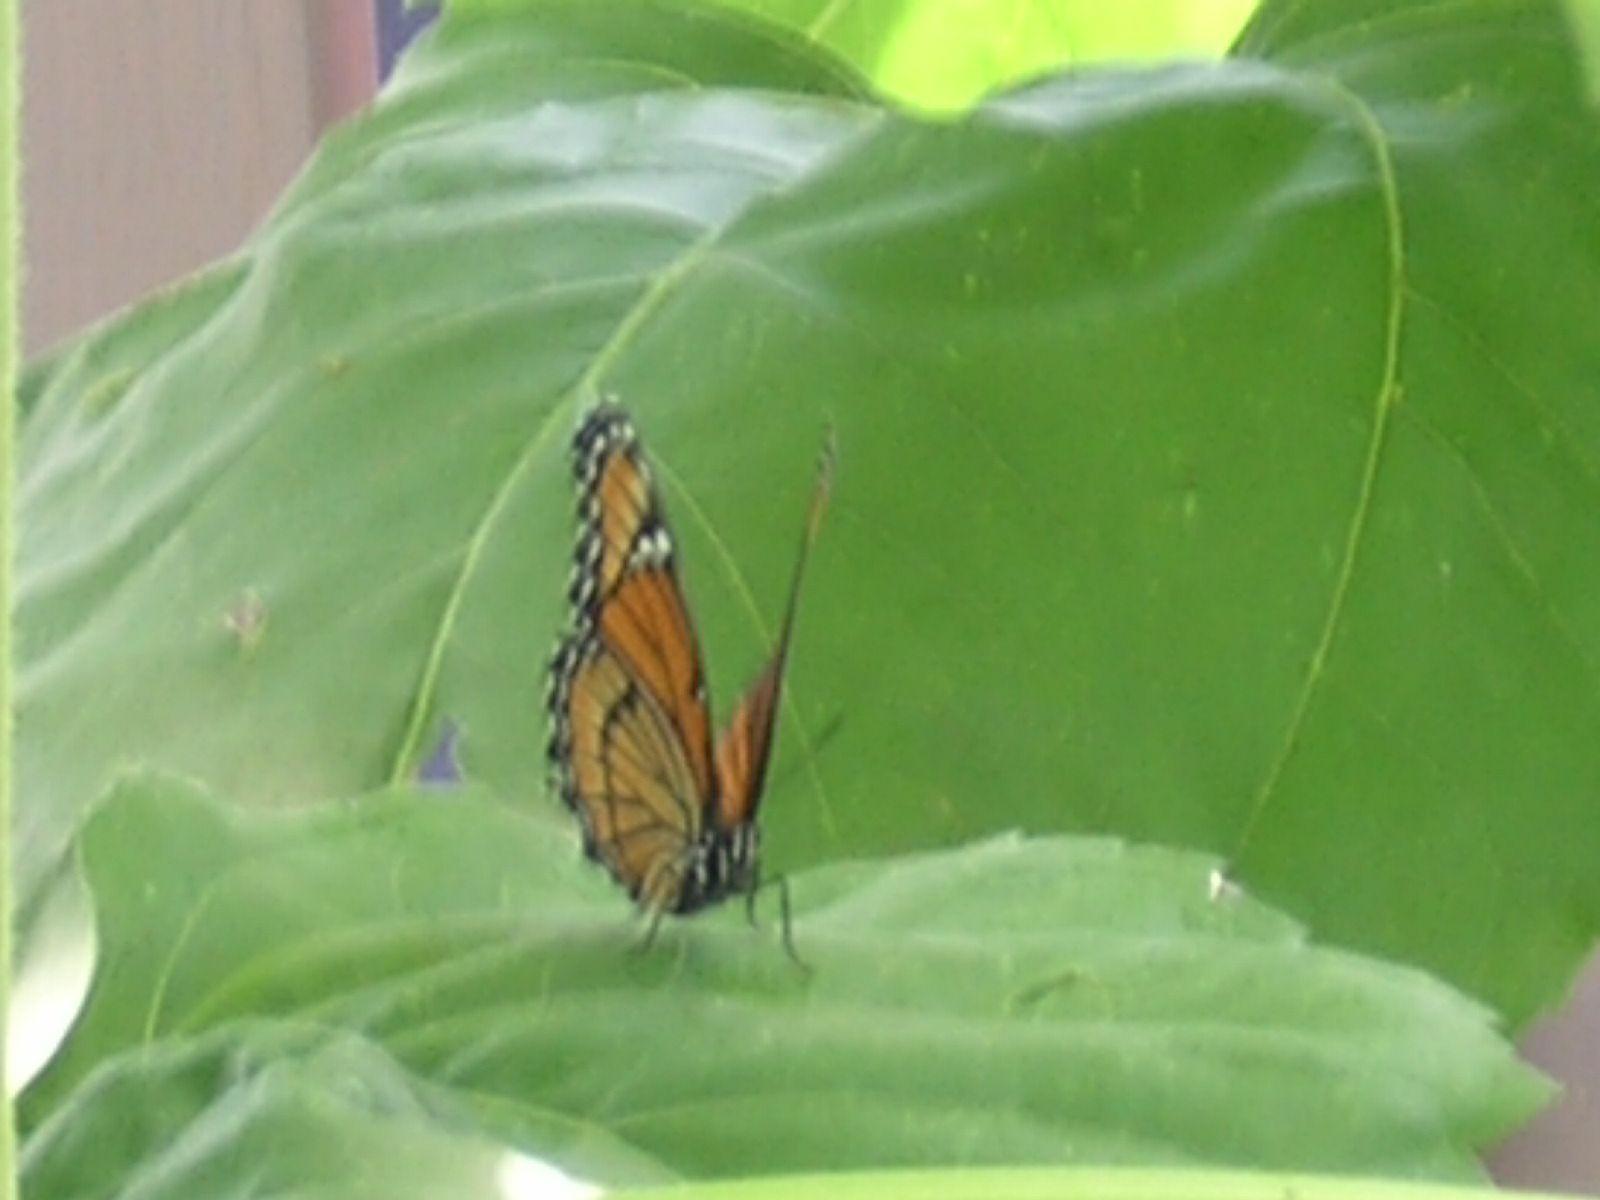 Butterfly on sunflower leaf